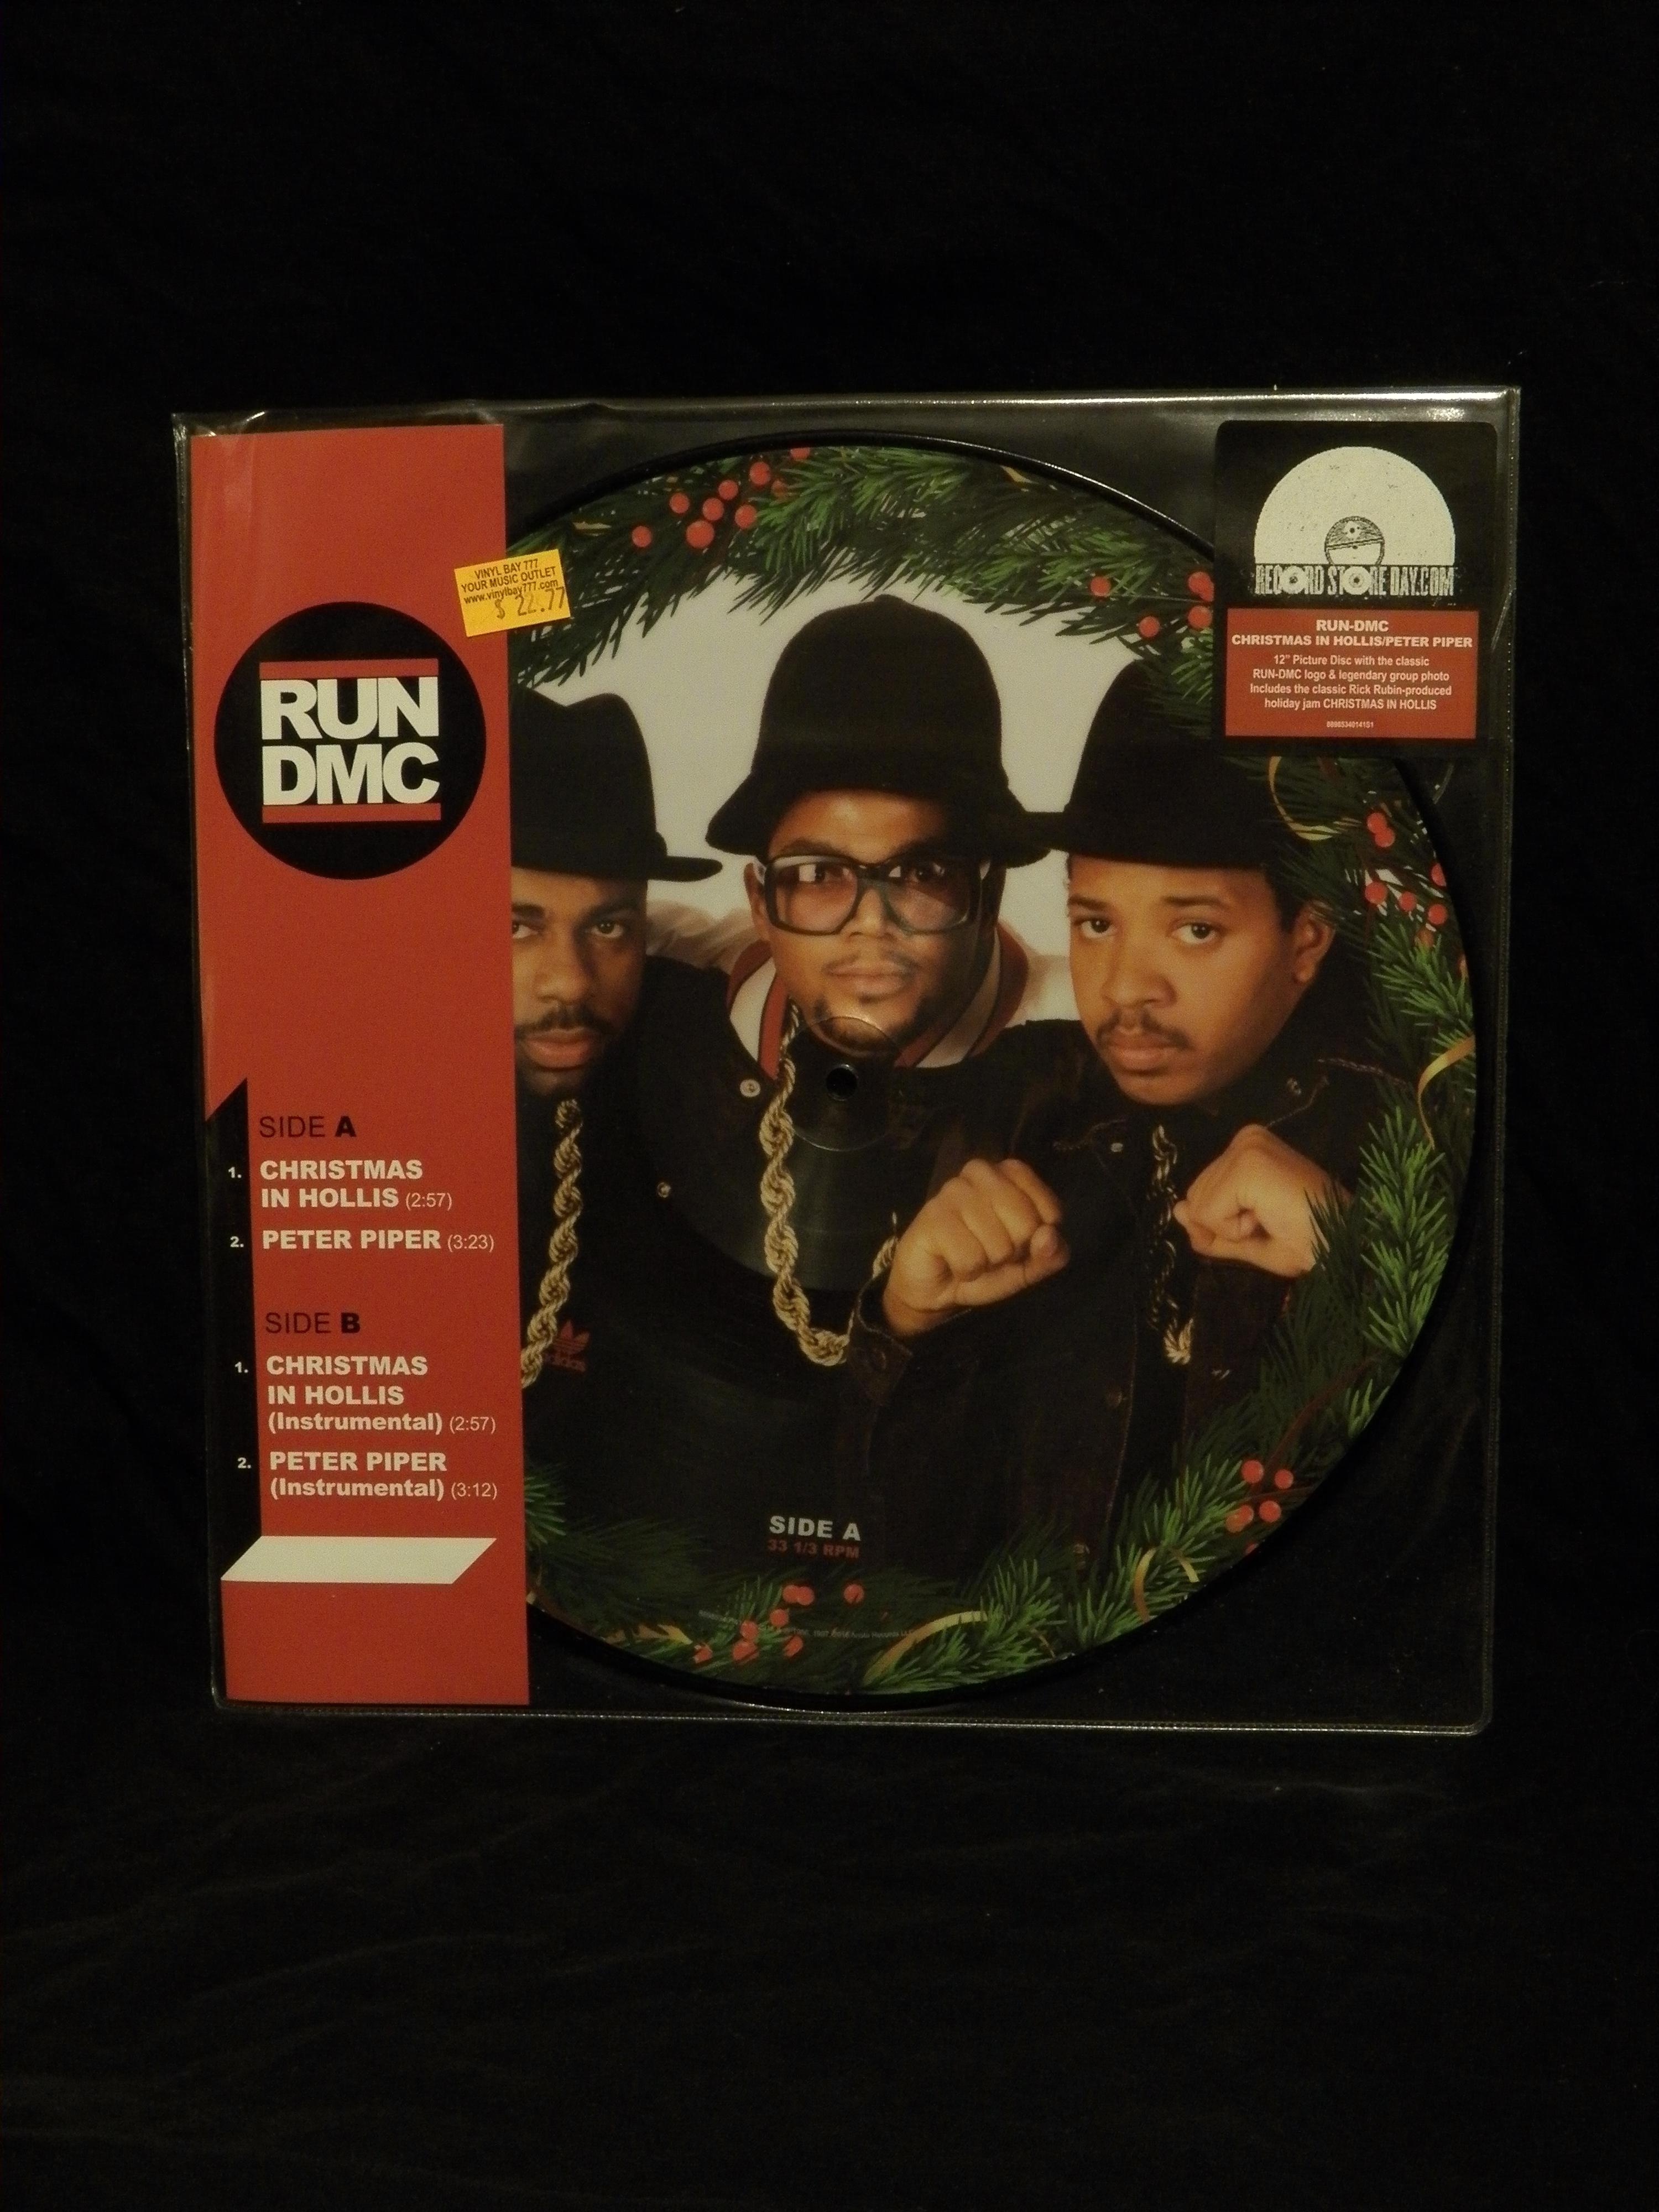 Run Dmc Christmas.Sealed 12 Picture Disc Run Dmc Christmas In Hollis Peter Piper 2016 Arista Records Rsd Vinylbay777